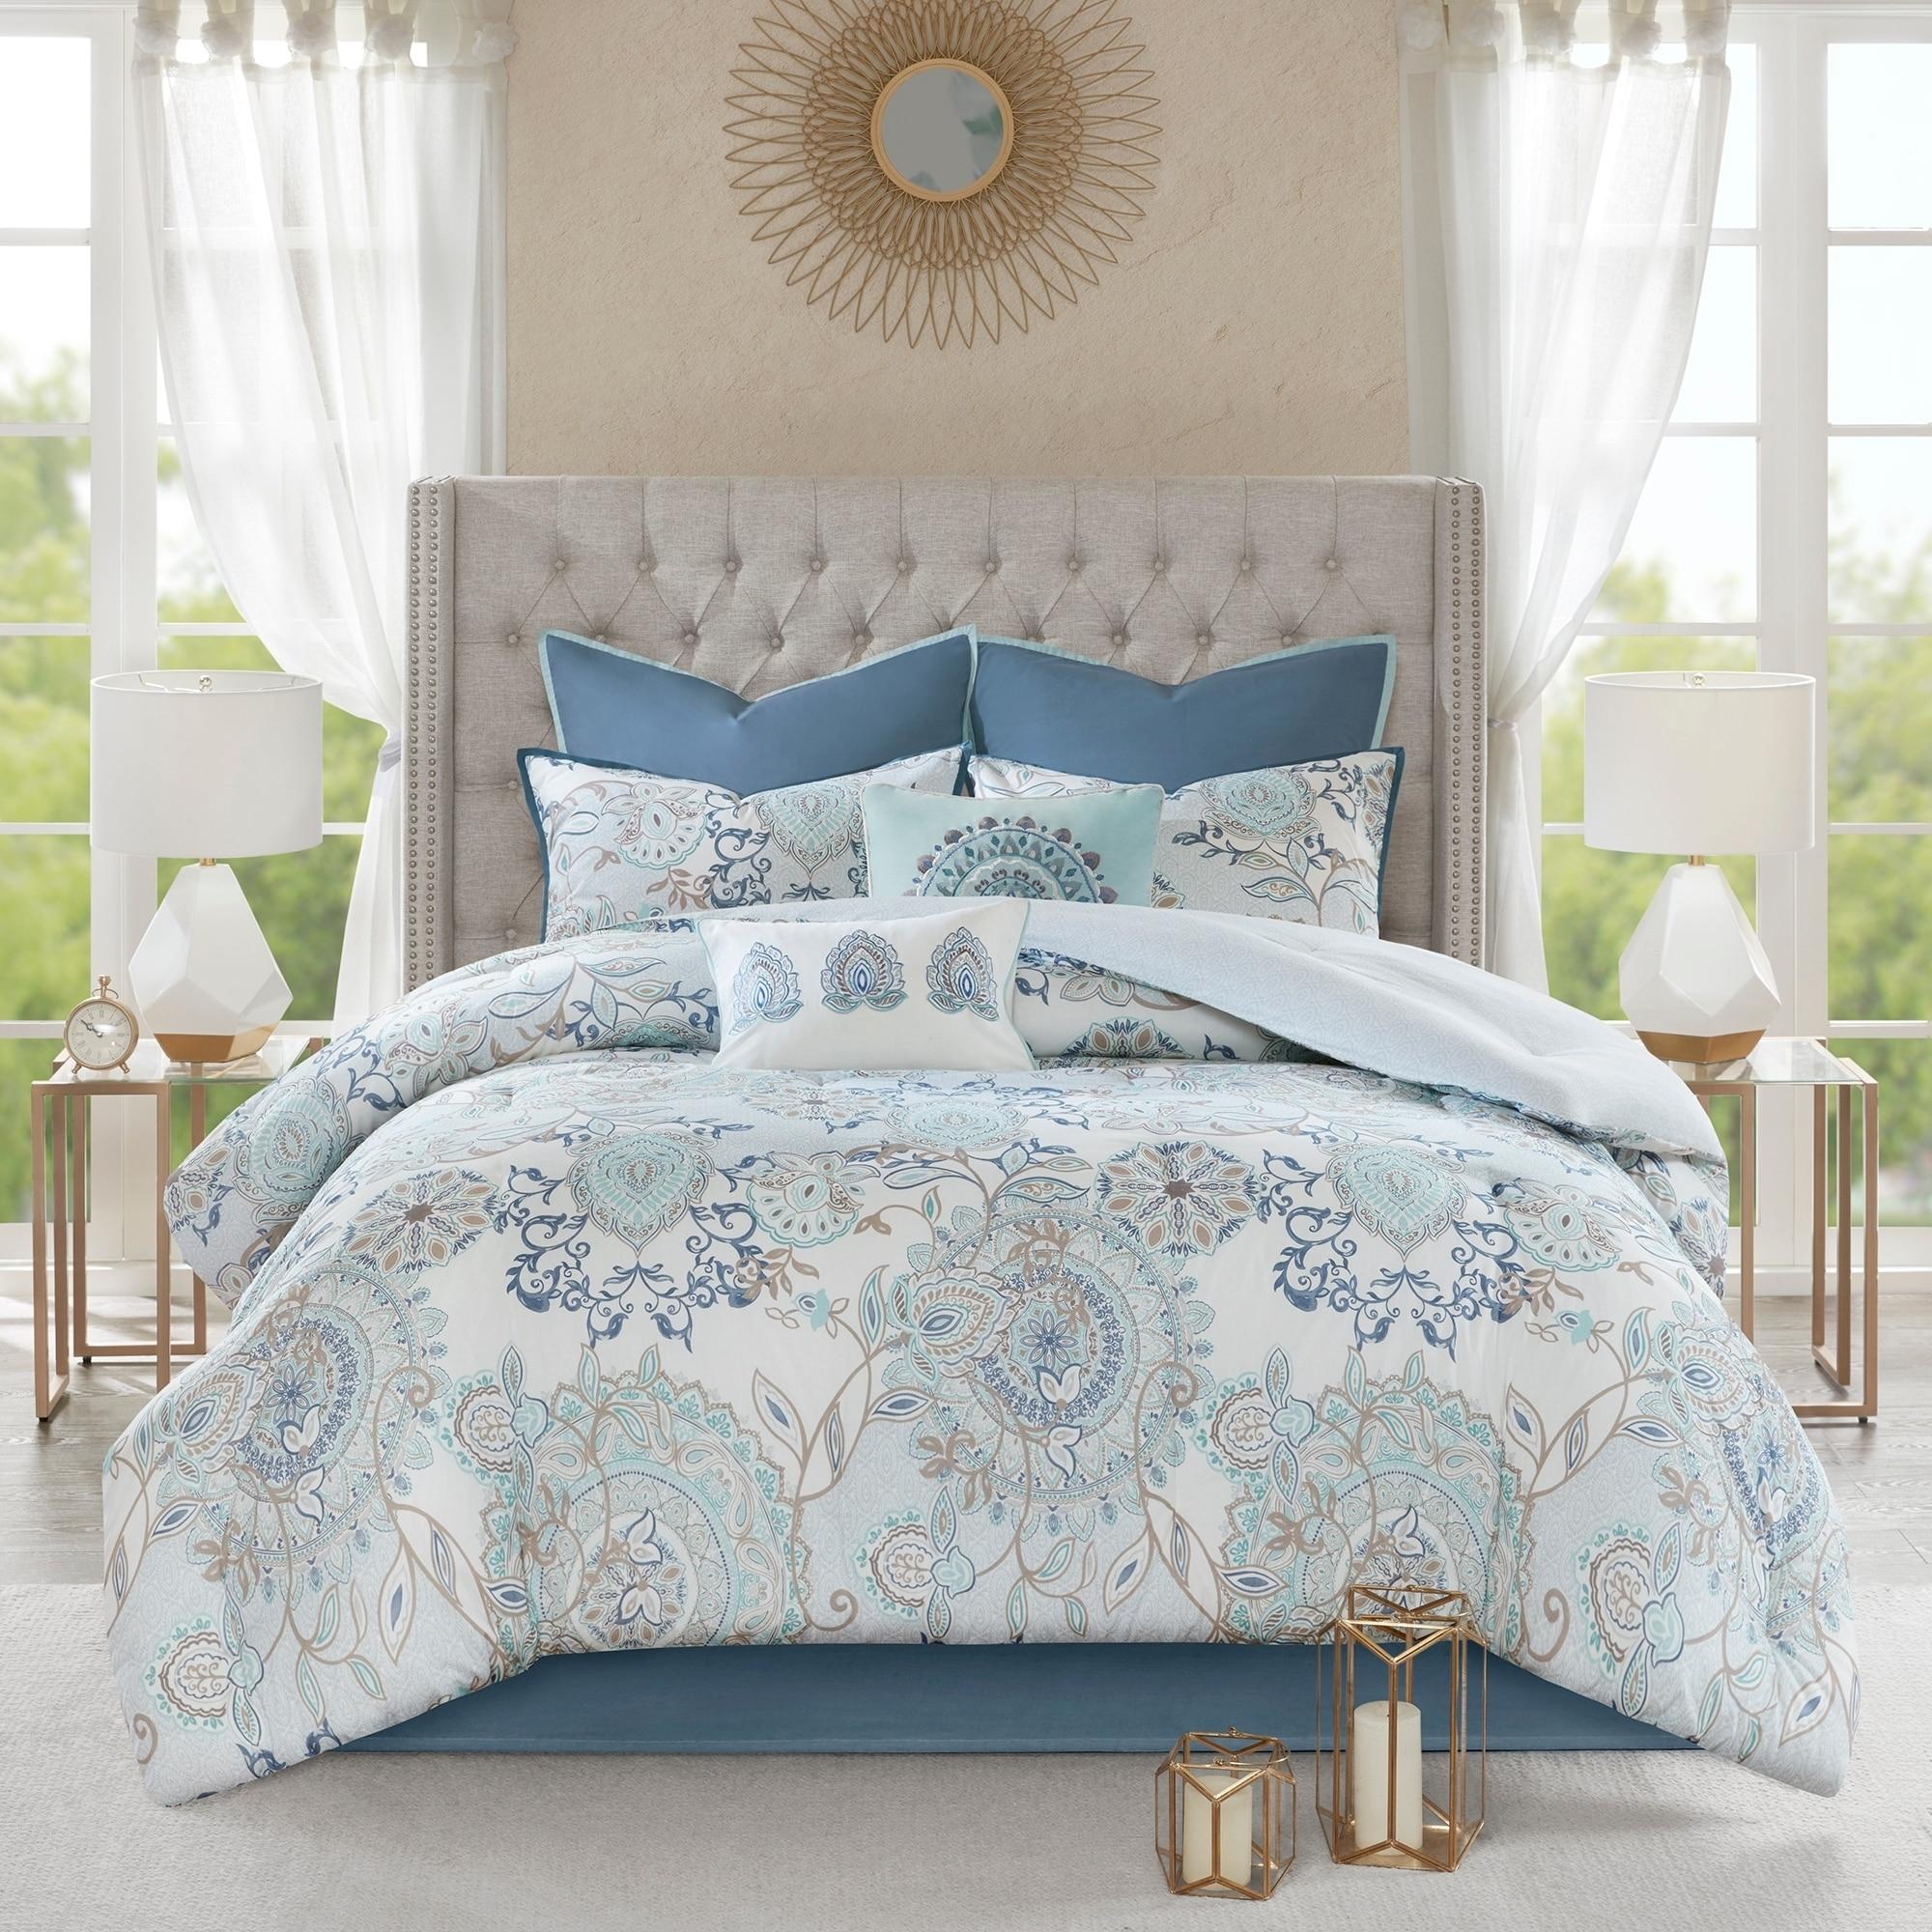 floral comforter sets find great fashion bedding deals shopping at rh overstock com